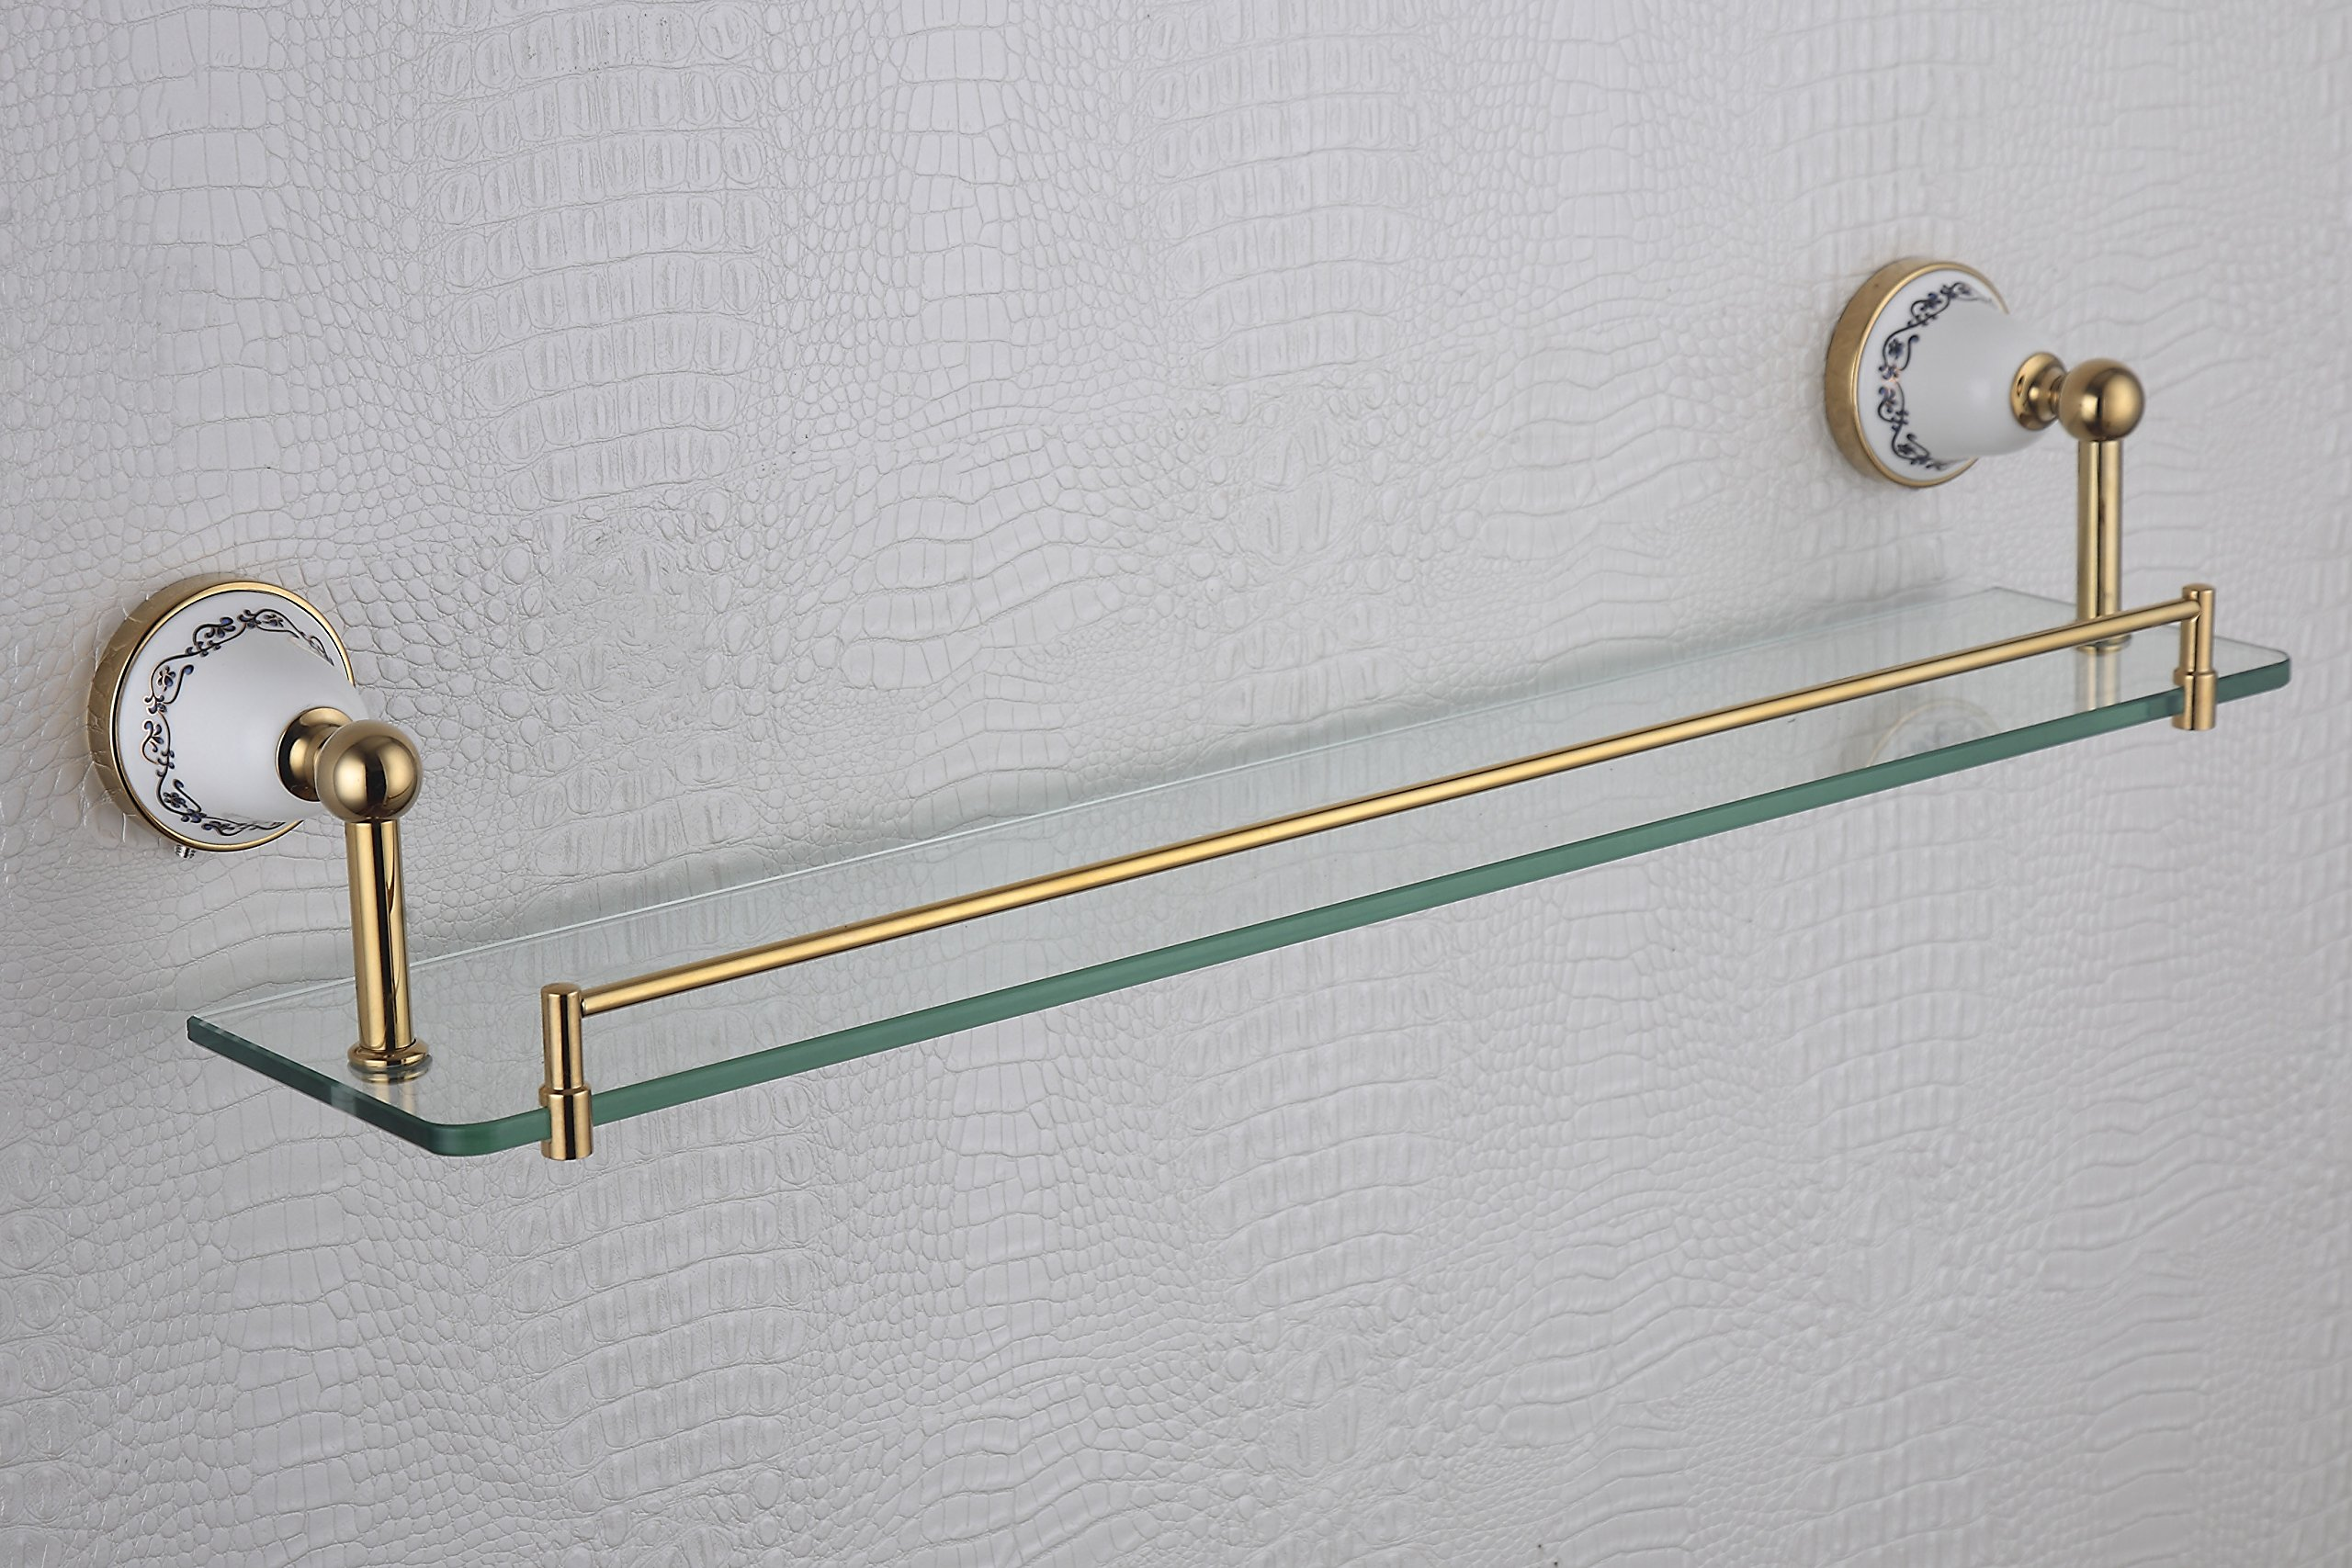 Cloud Power Bathroom Brass Single Glass Shelves Single Glass Shelves Titanium Wall-mounted Single Glass Shelves Porcelain Decorated